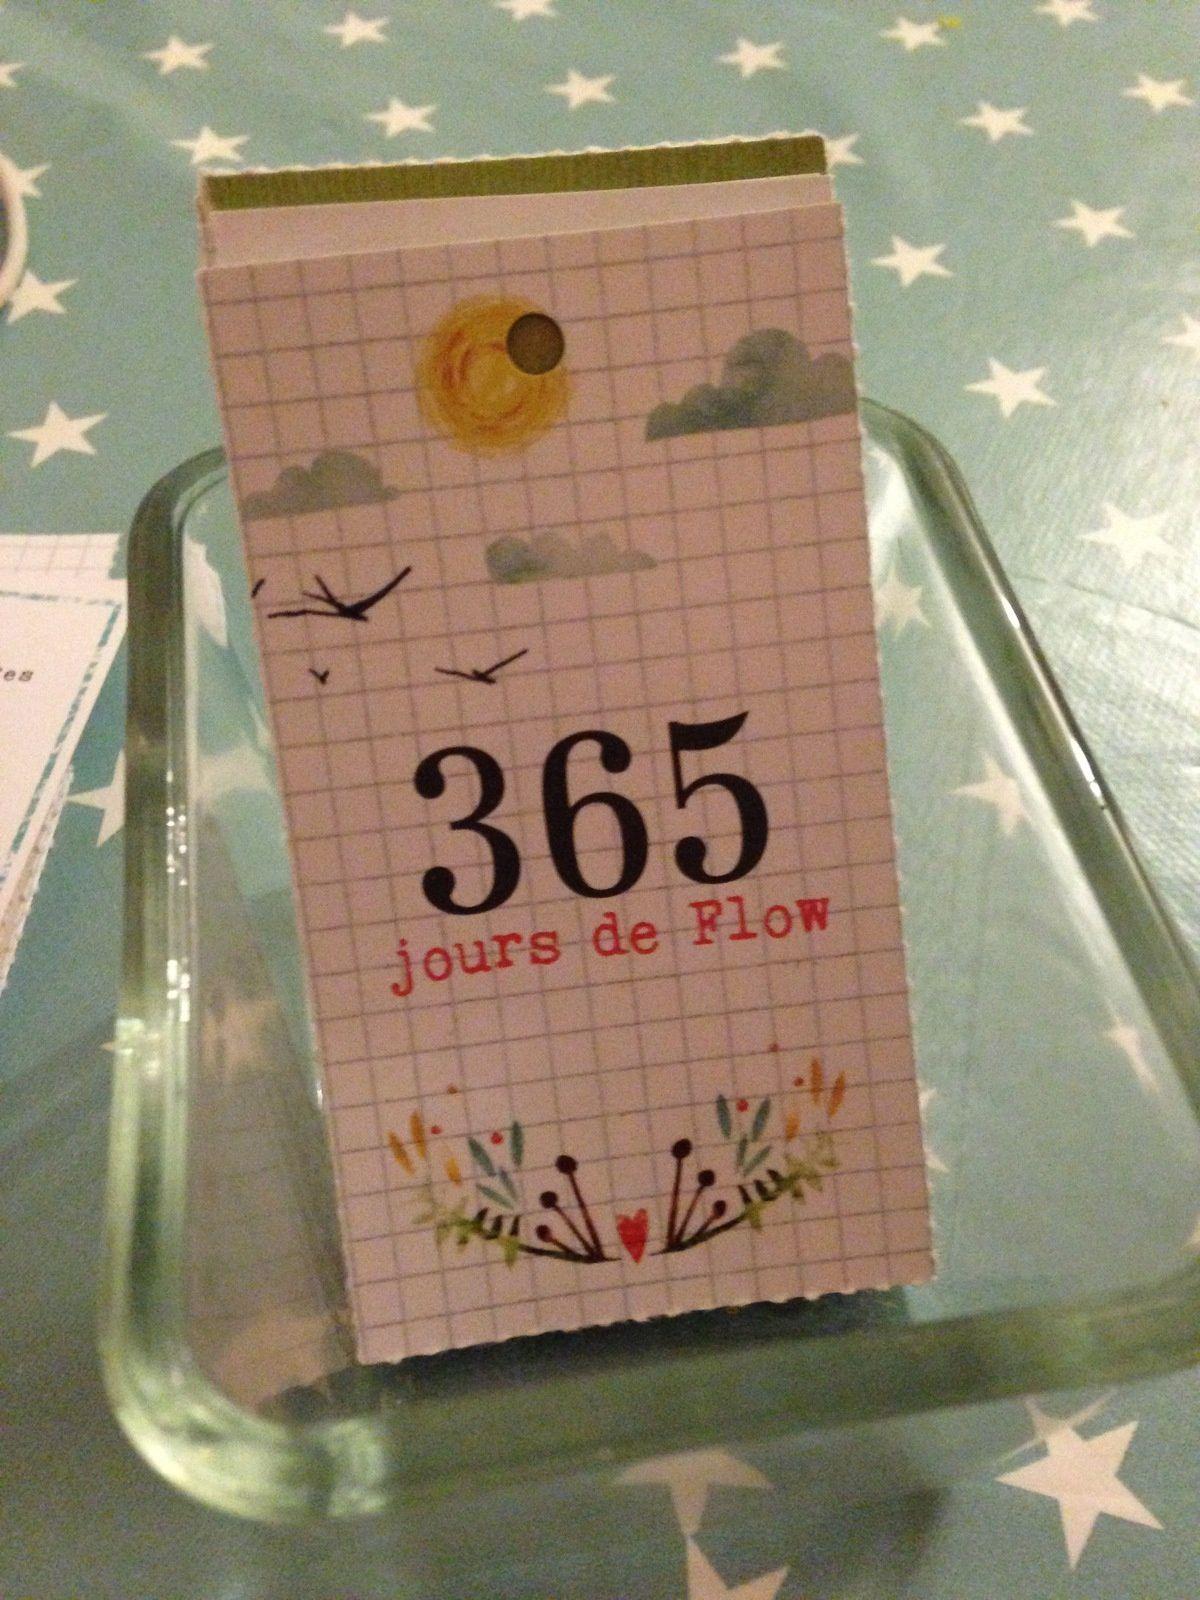 #flowmagazine #calendrierperpetuel #cadeau #charlotteblabla